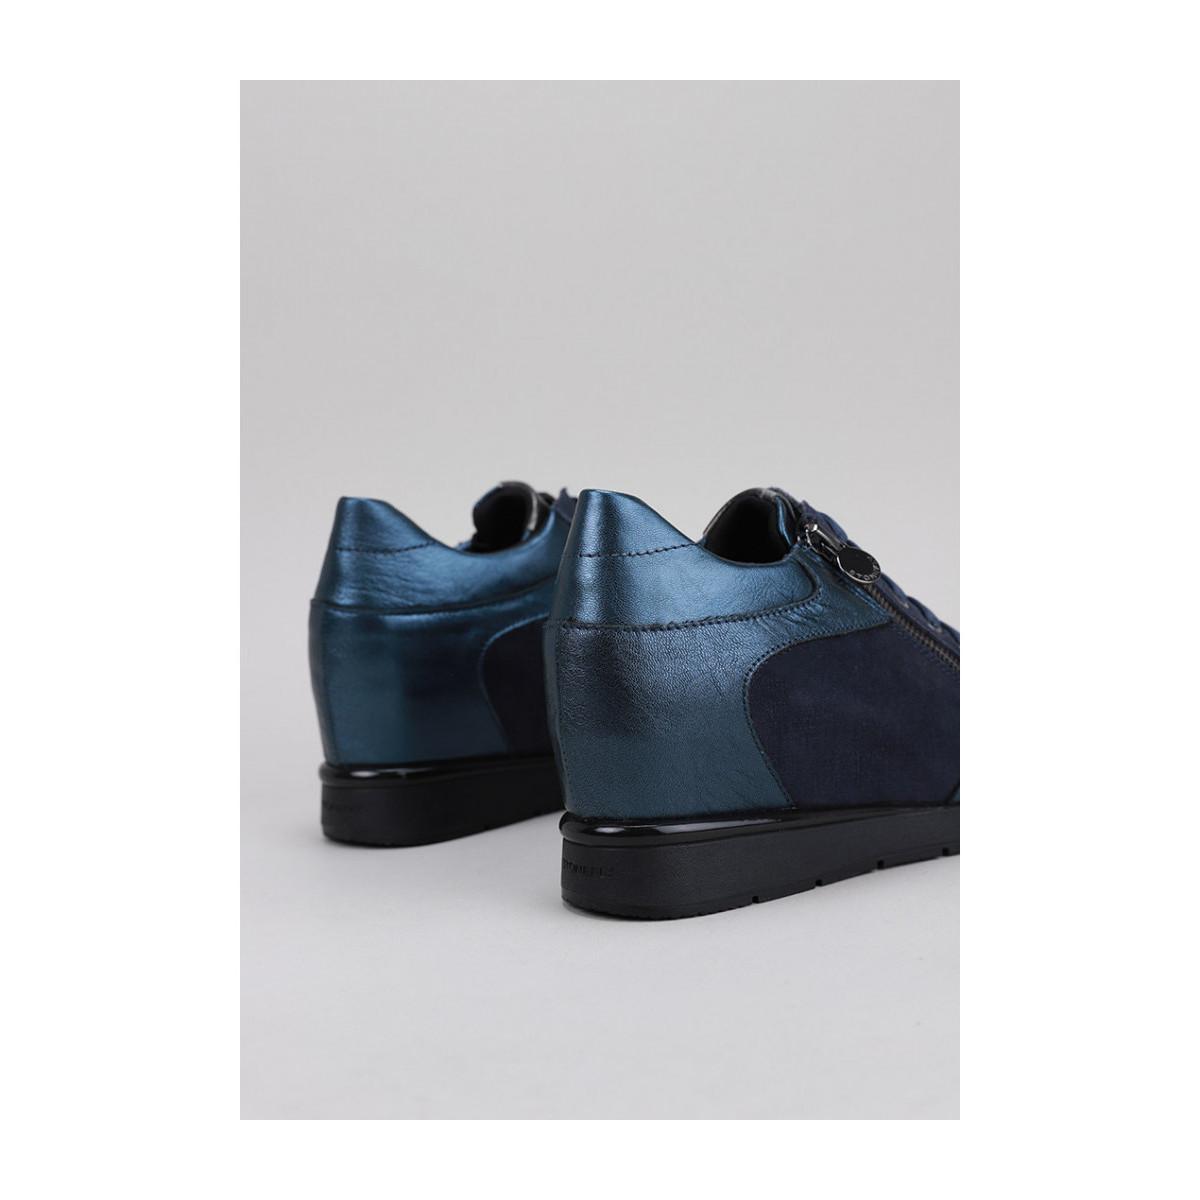 212311 Chaussures Stonefly en coloris Bleu